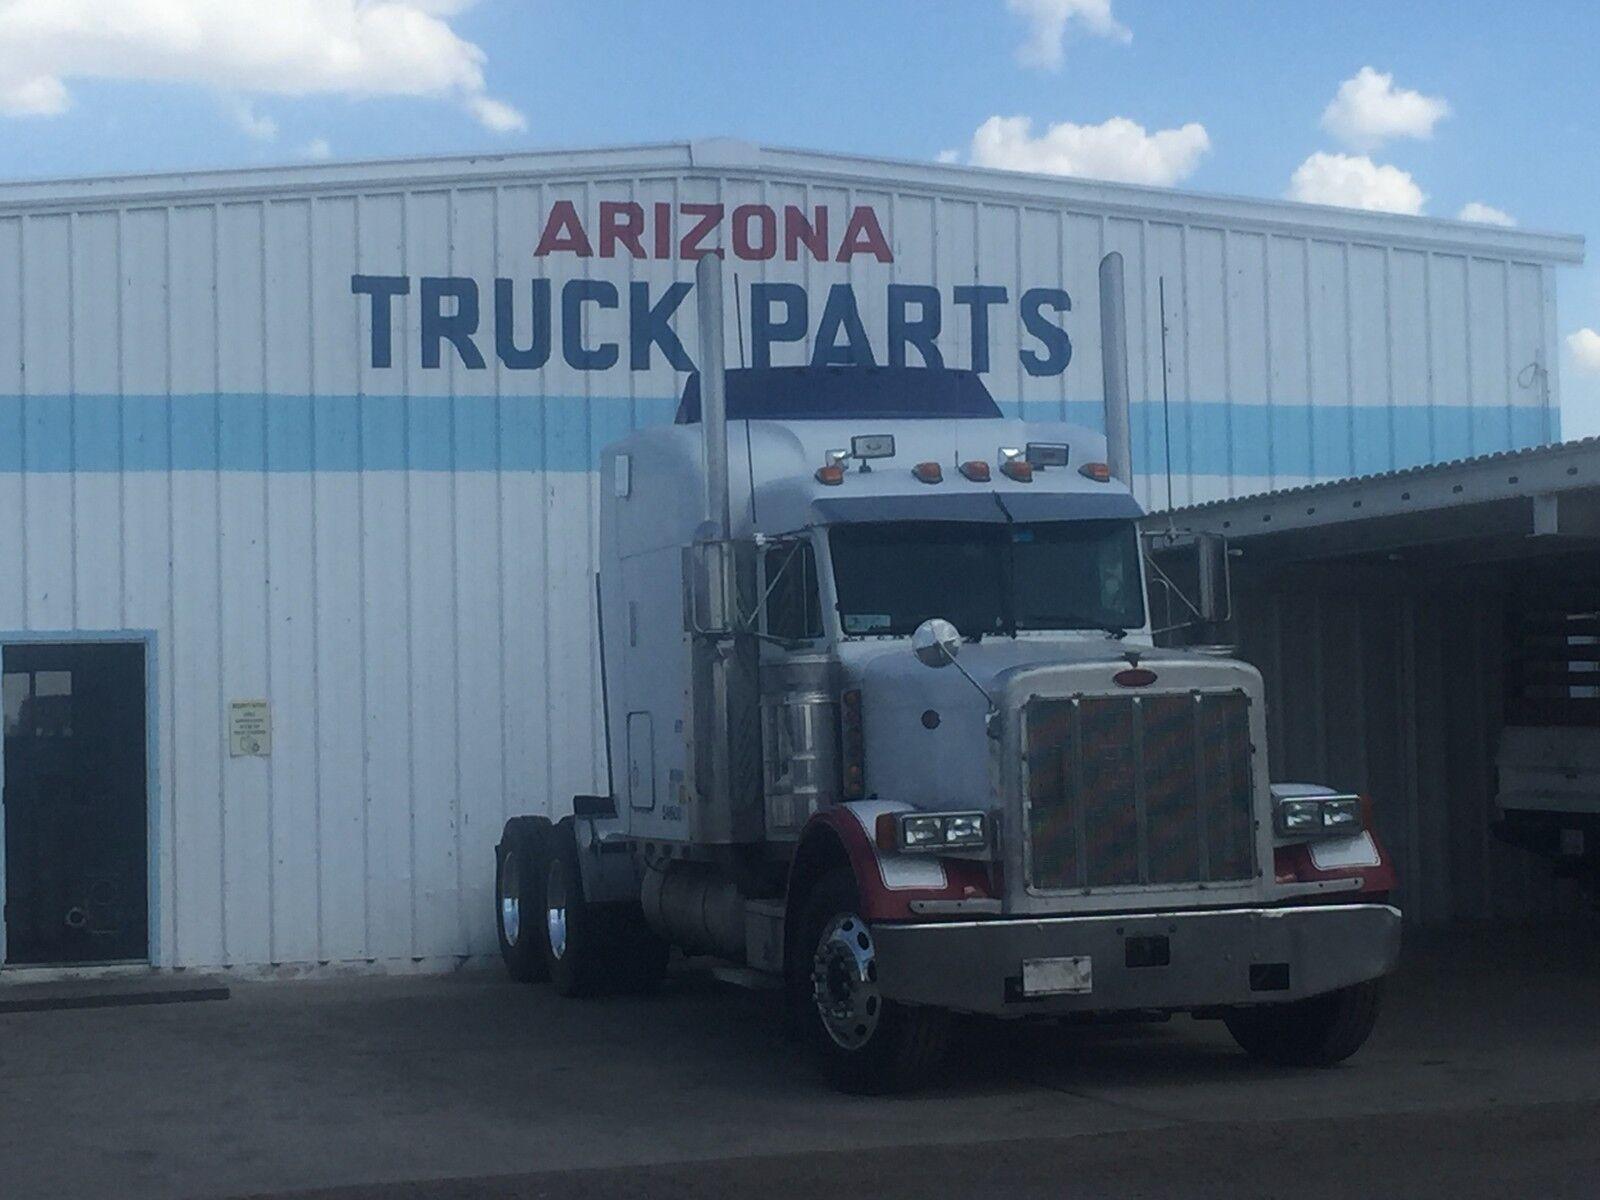 Arizona Truck Parts